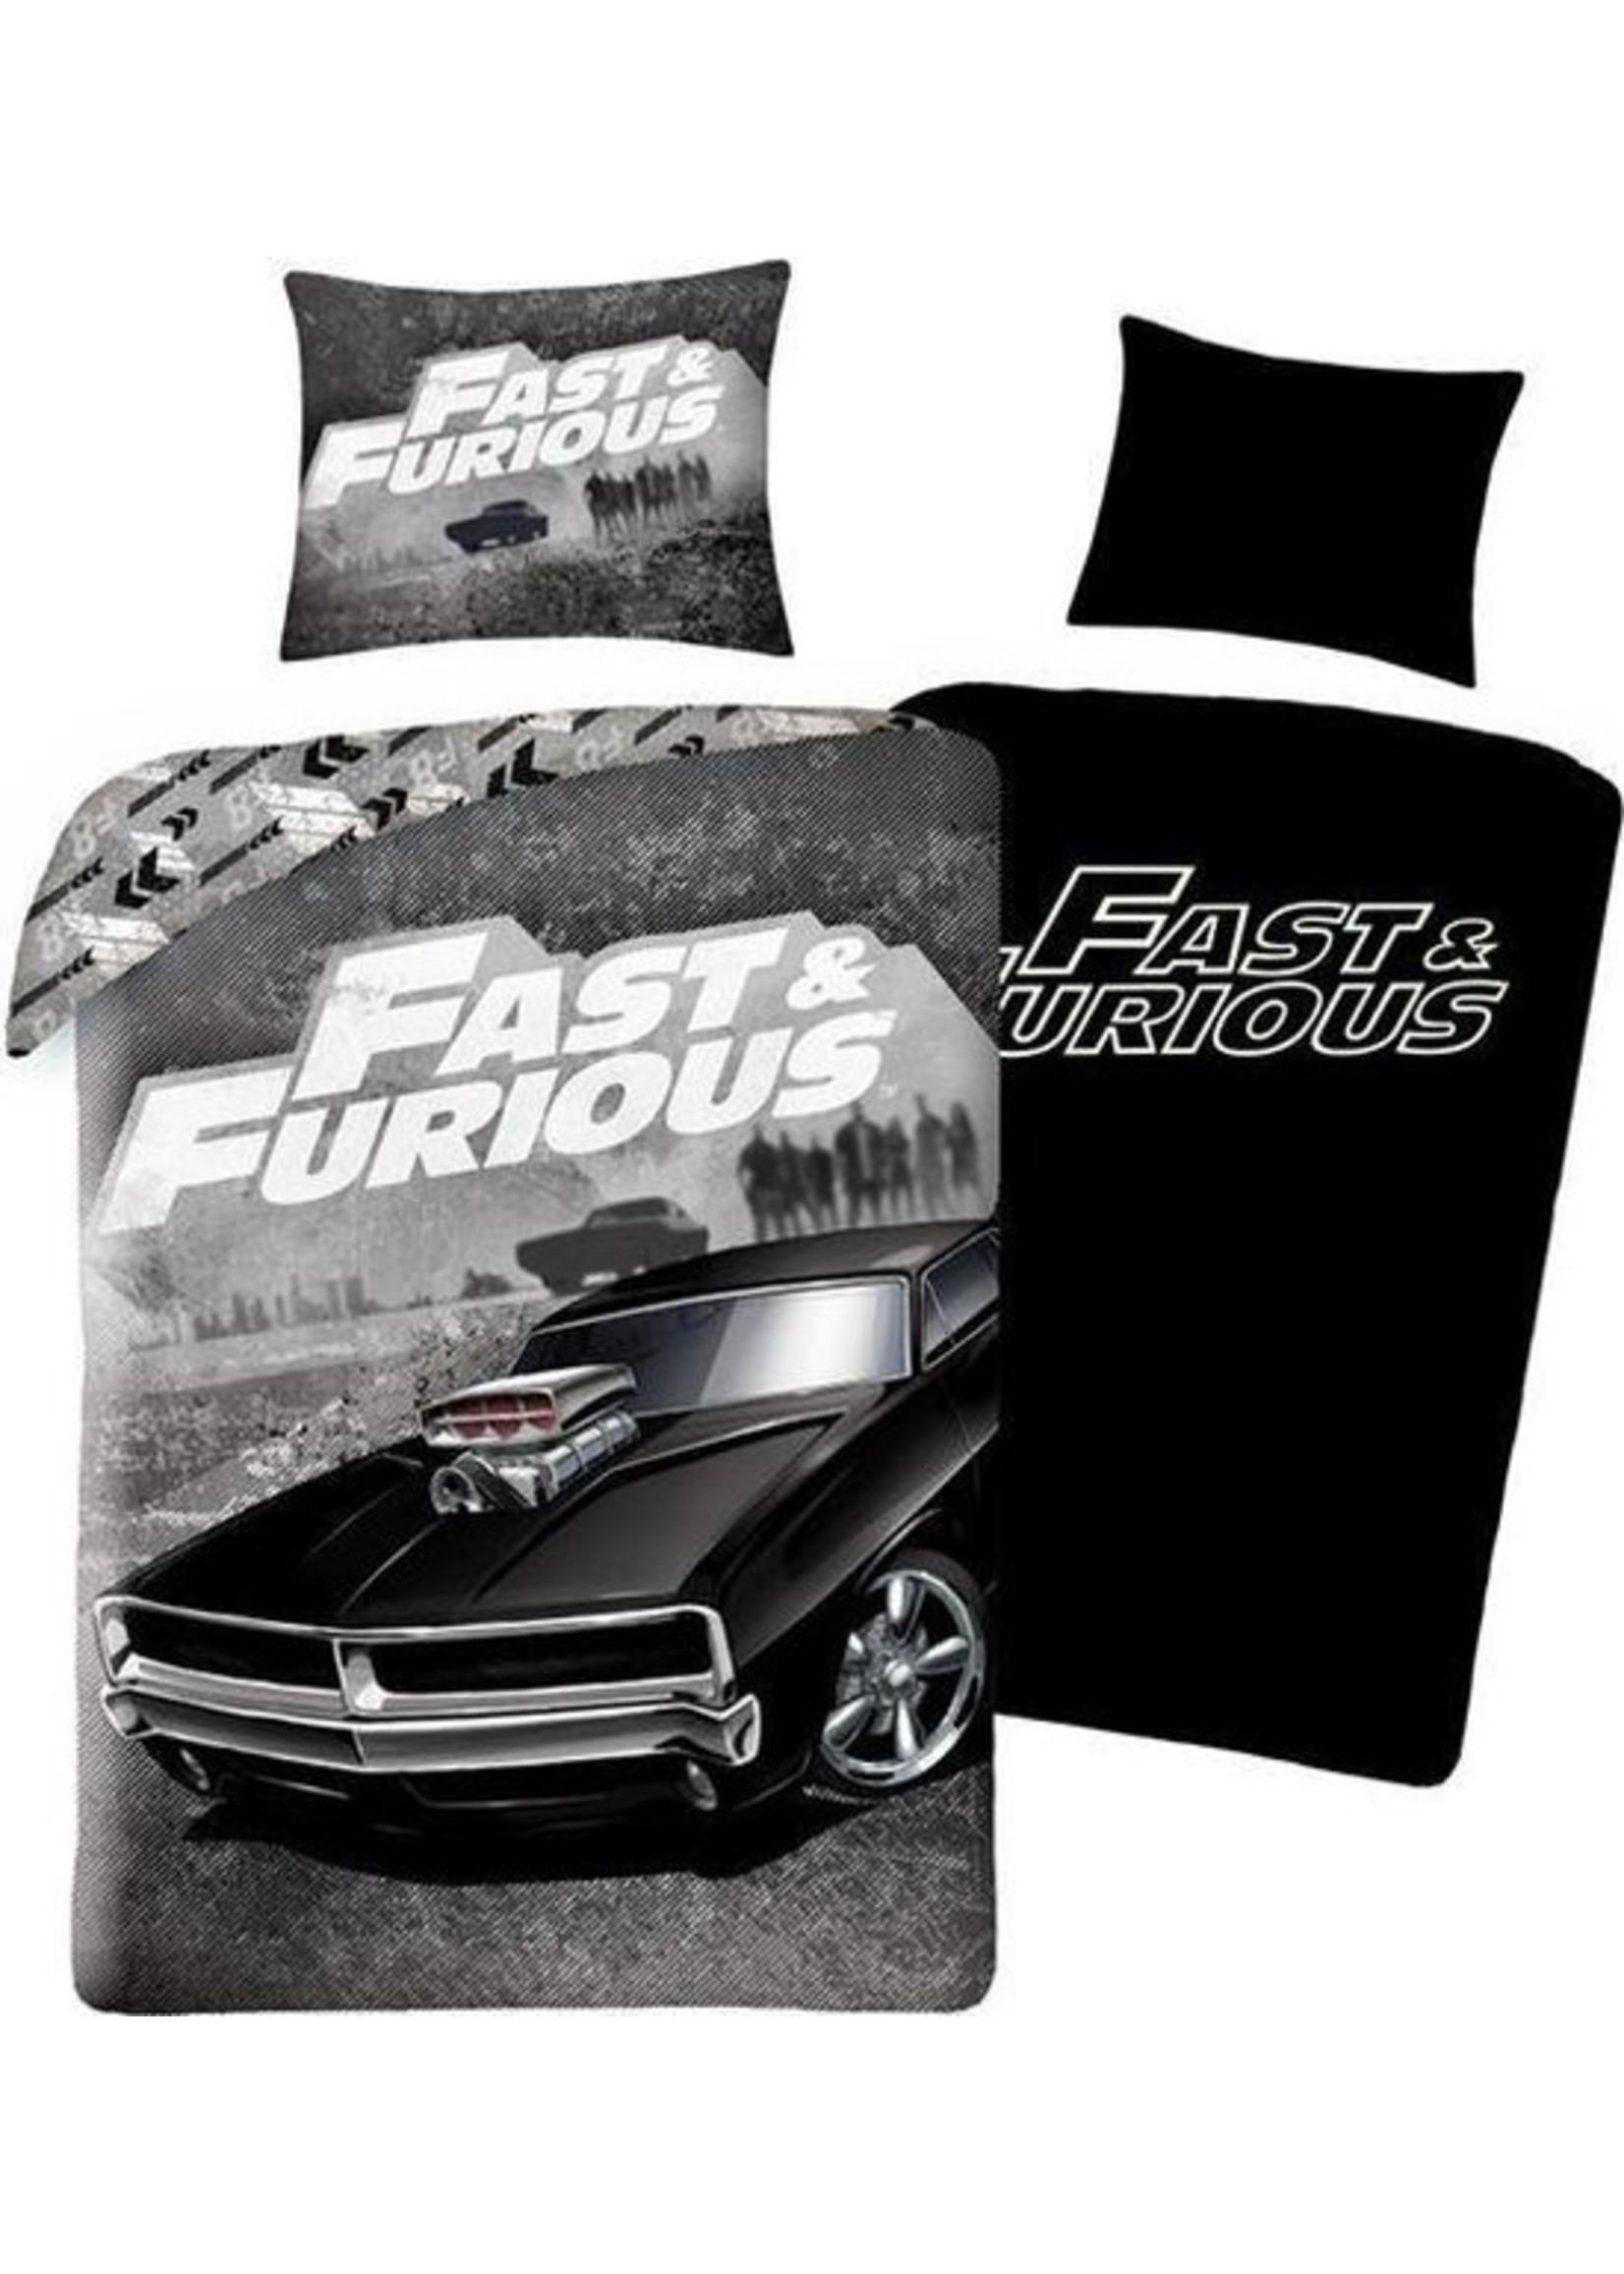 Fast & Furious Dekbedovertrek Glow in the Dark